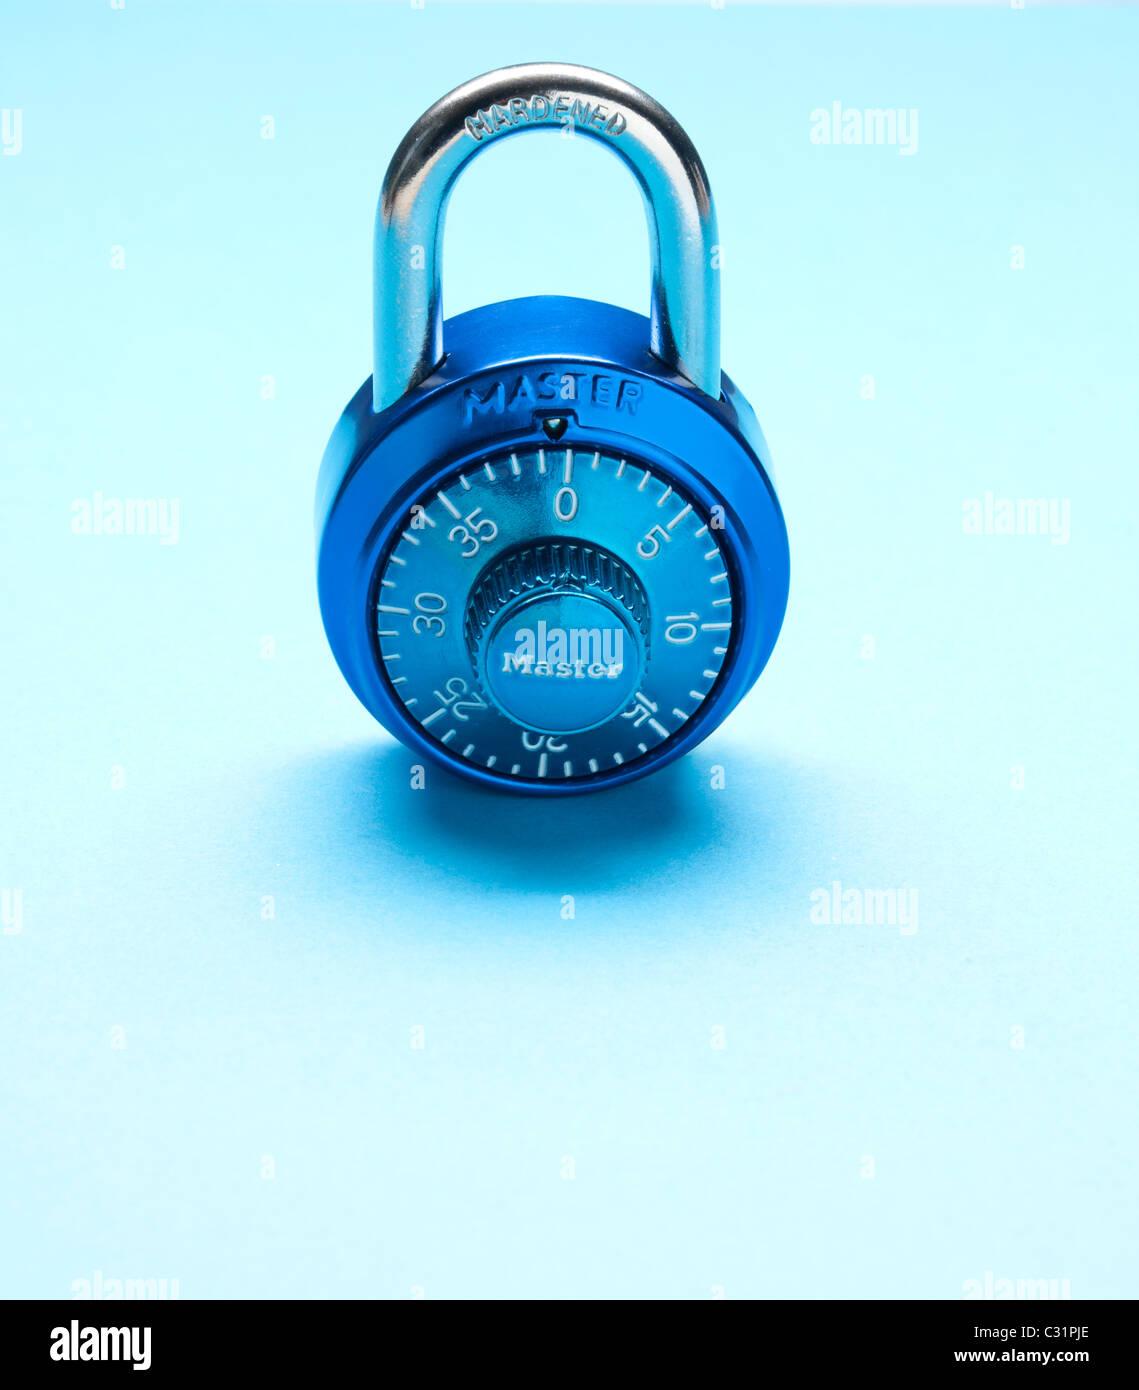 combination lock - Stock Image